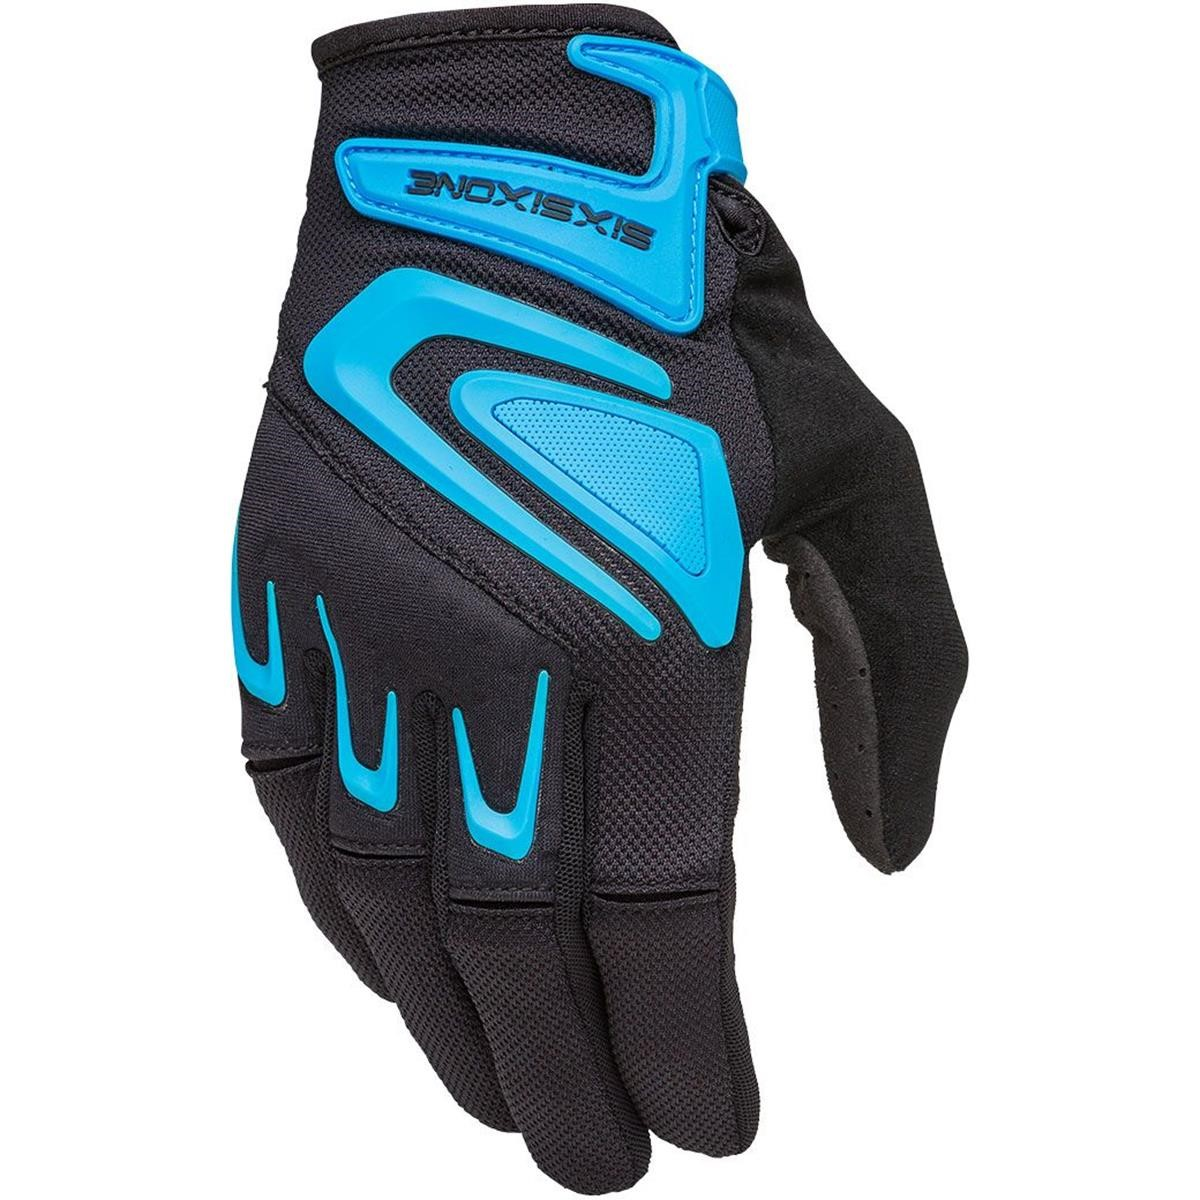 SixSixOne Handschuhe 661 Rage, XS, Schwarz